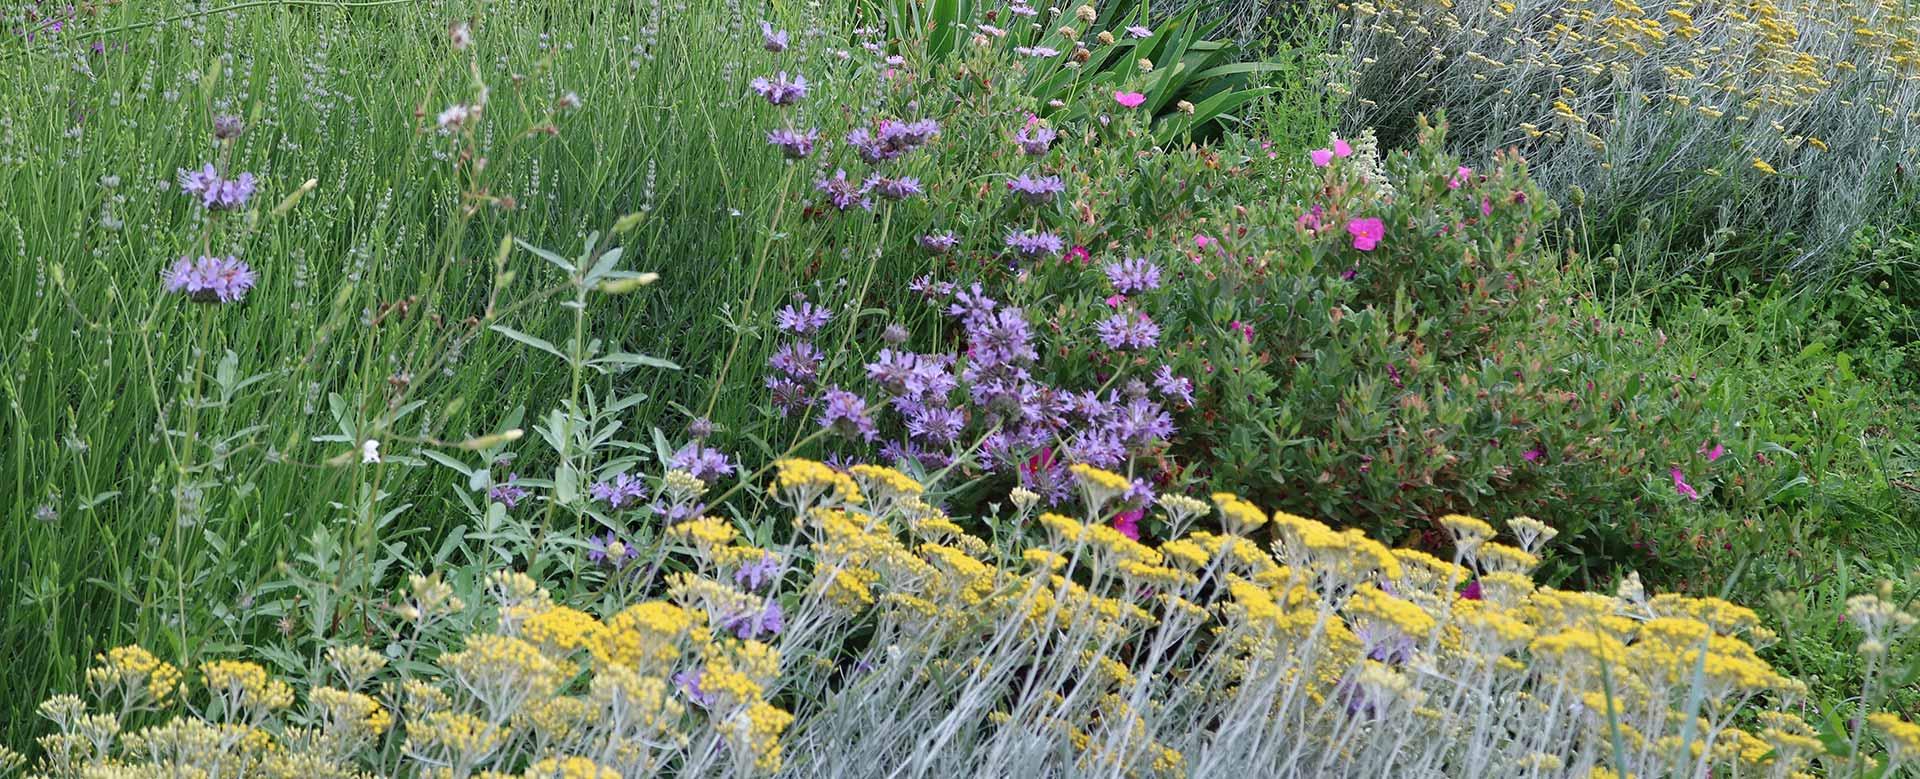 Garden Designer - Consulente | Stefano Assogna